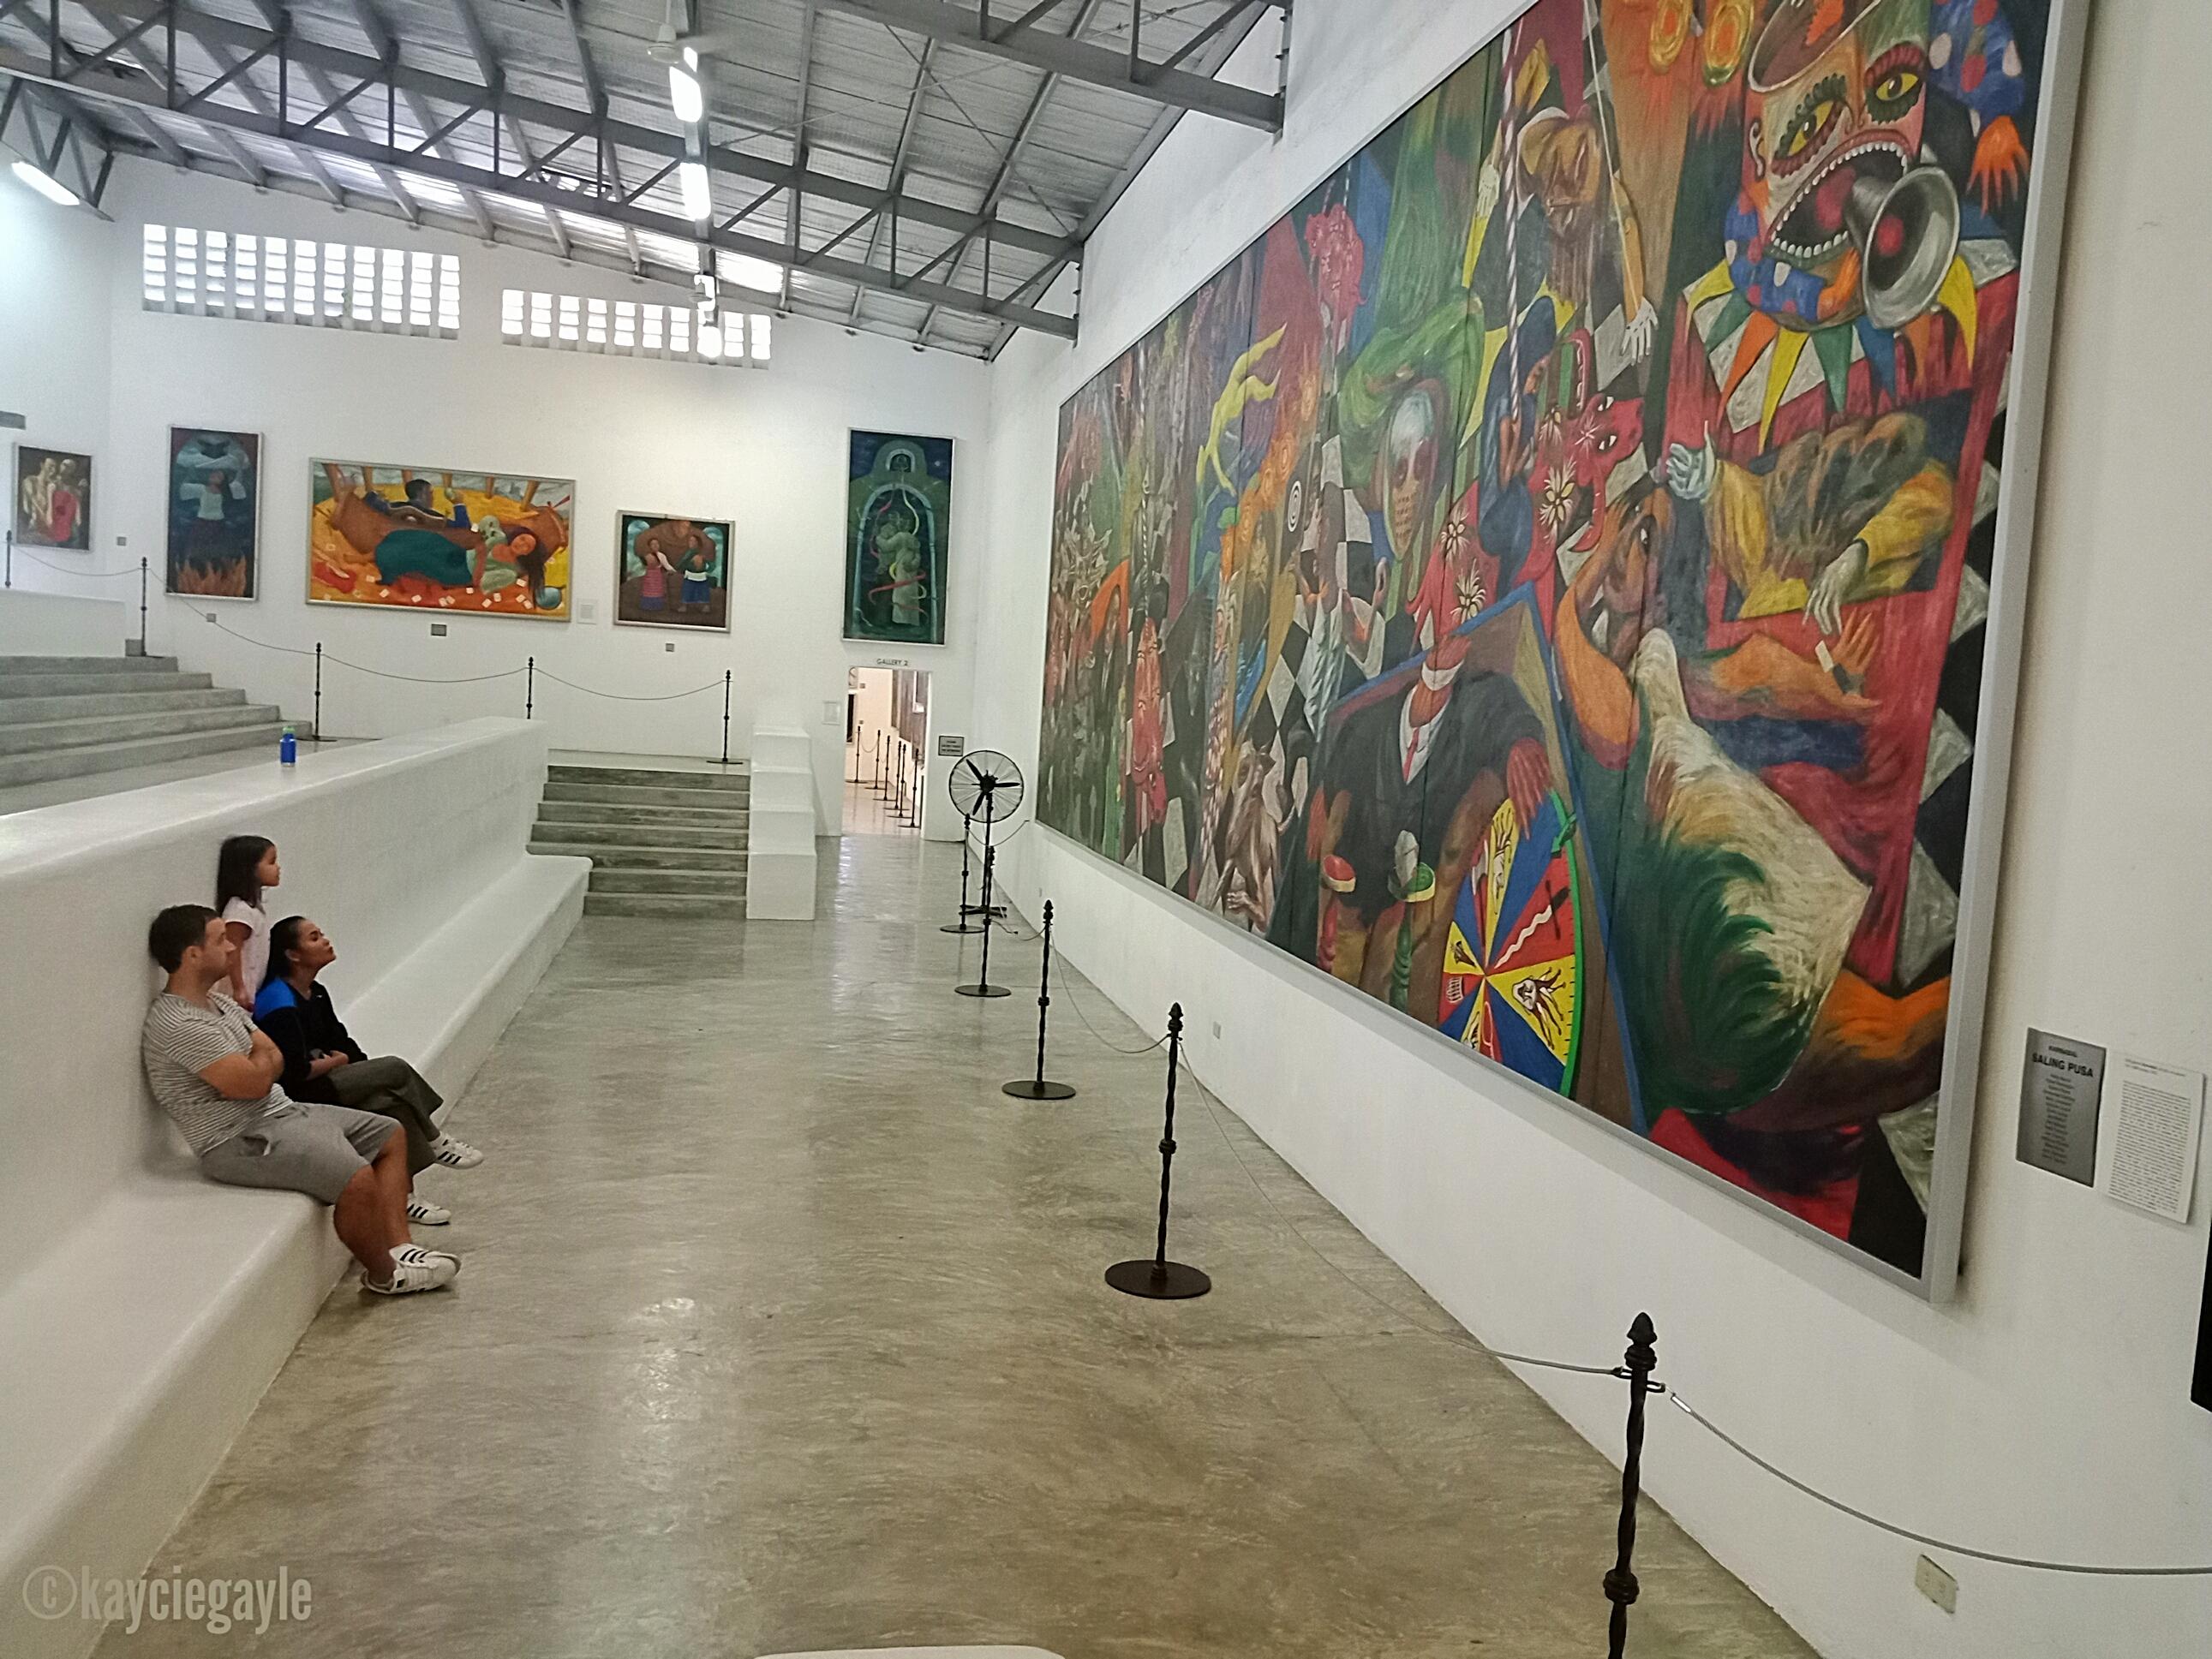 85 pinto art museum - misswoman.co